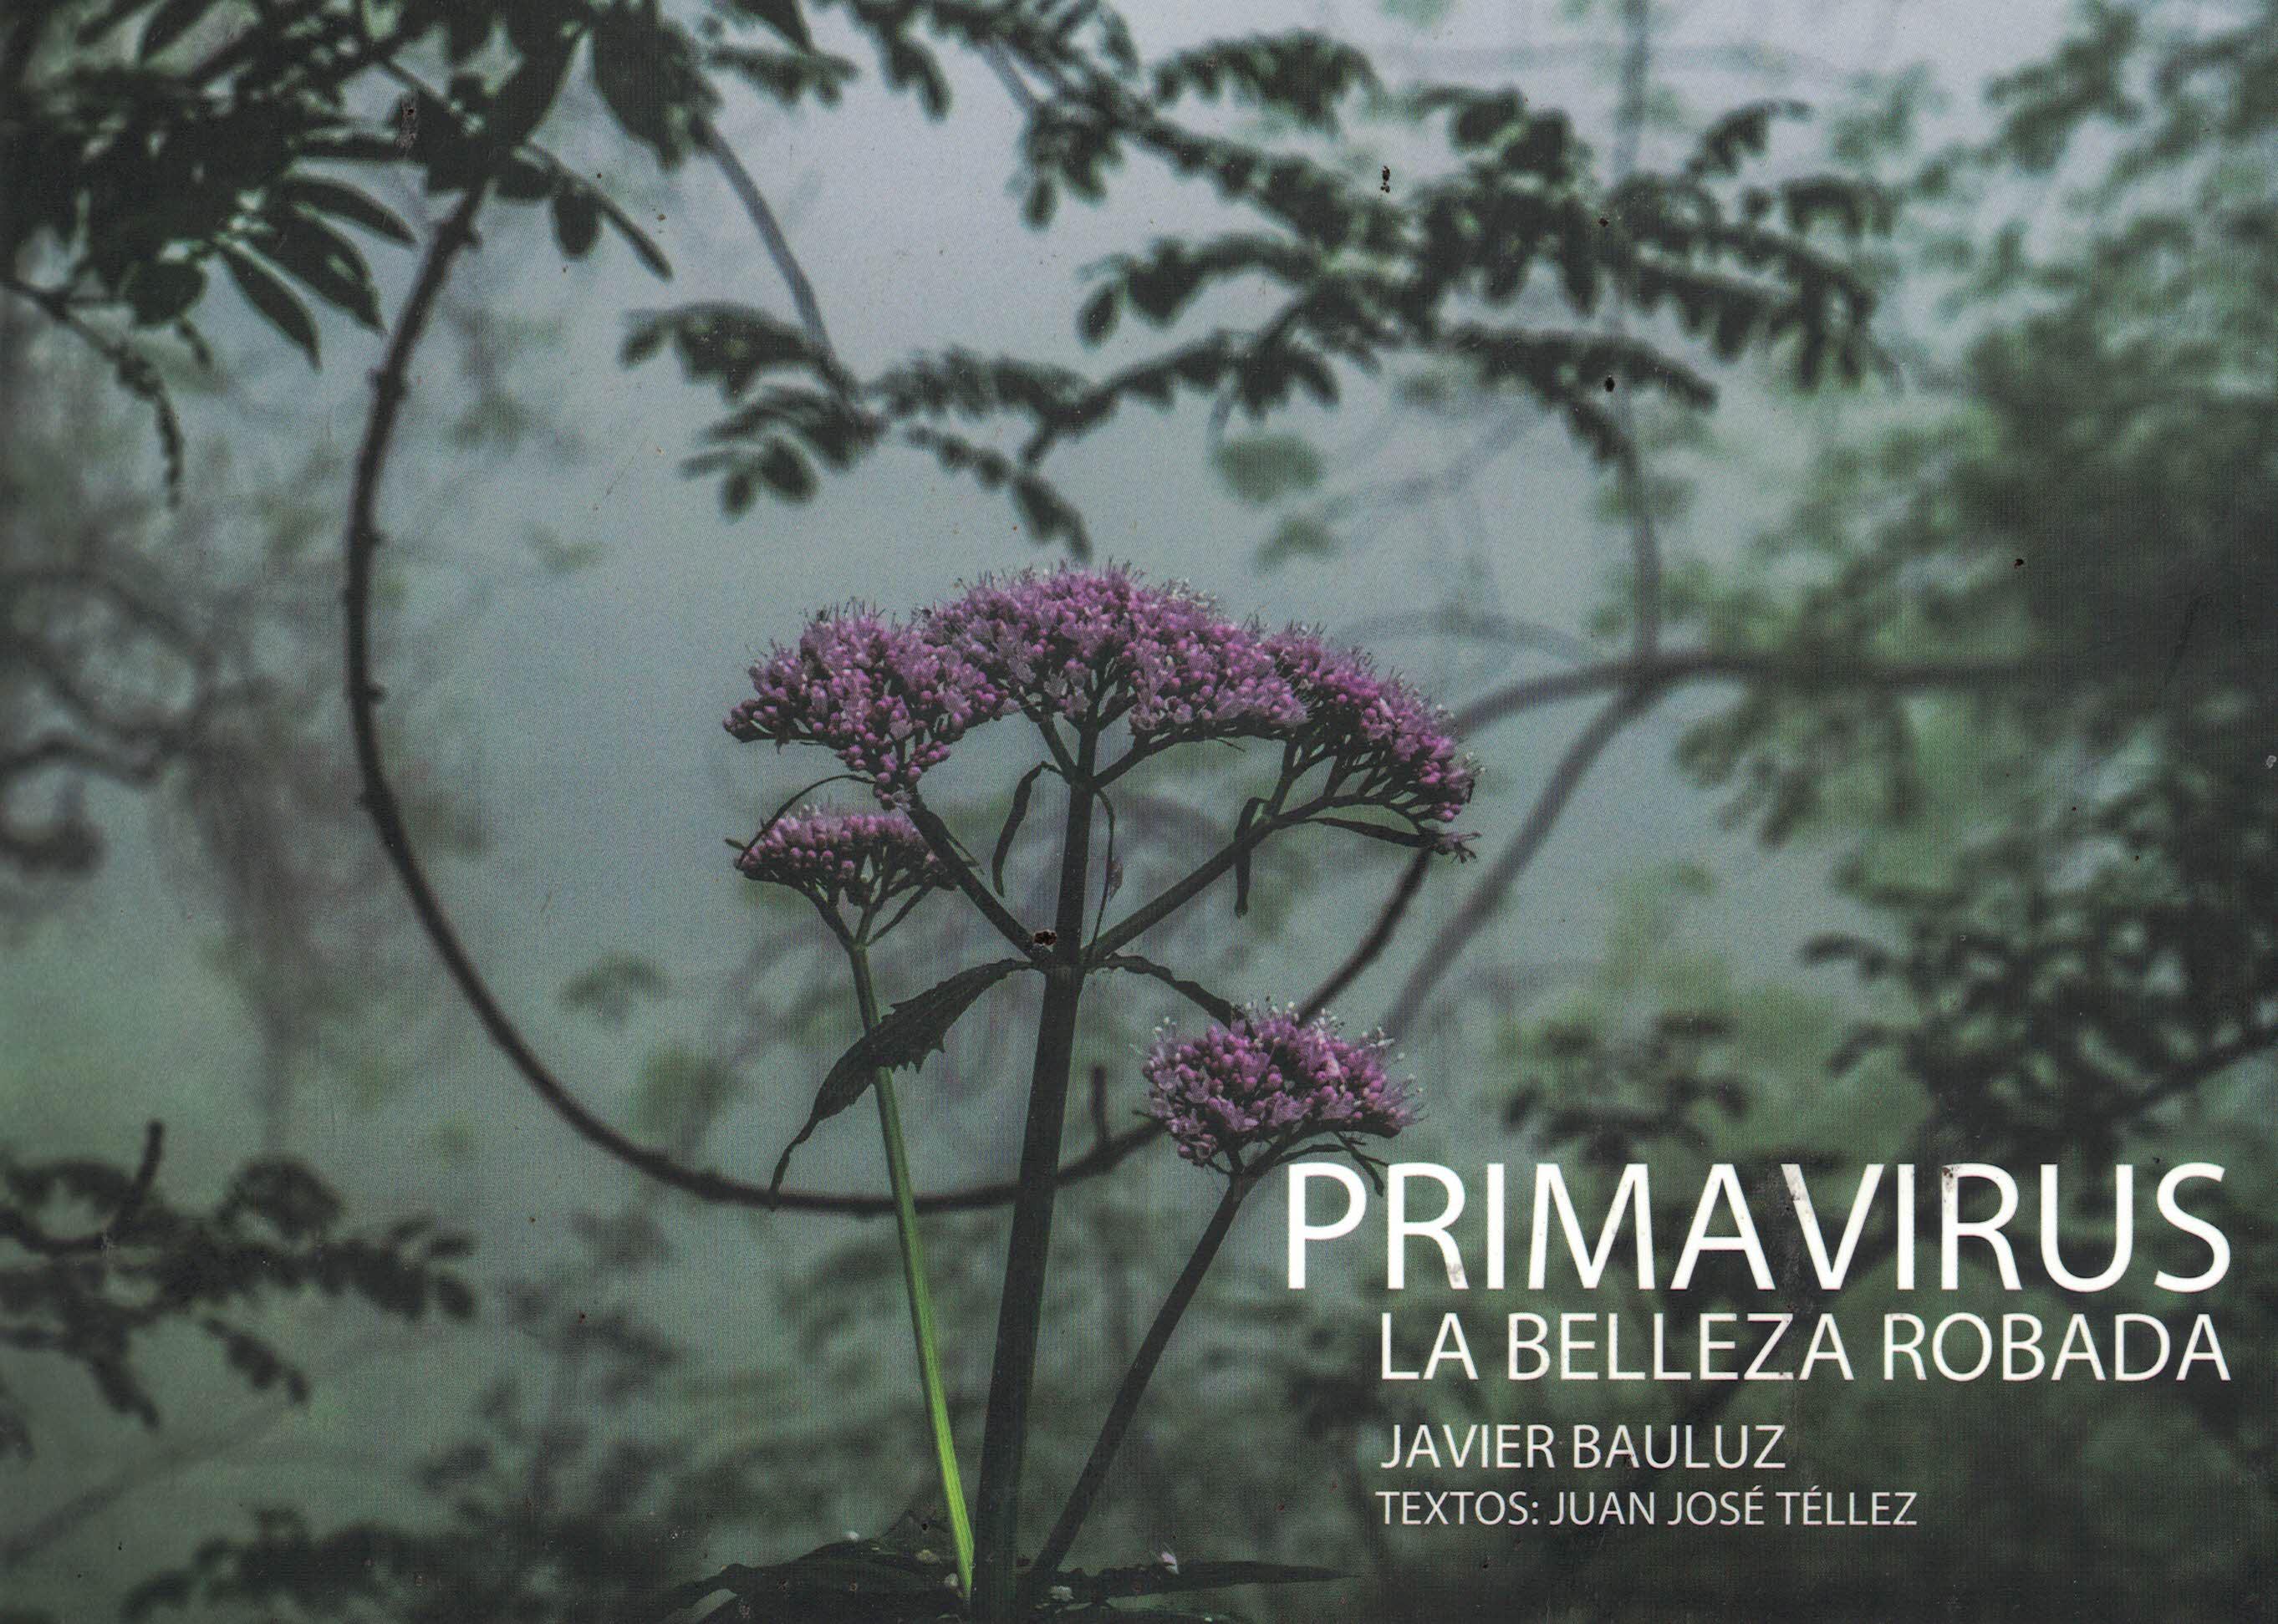 Primavirus «La belleza robada»